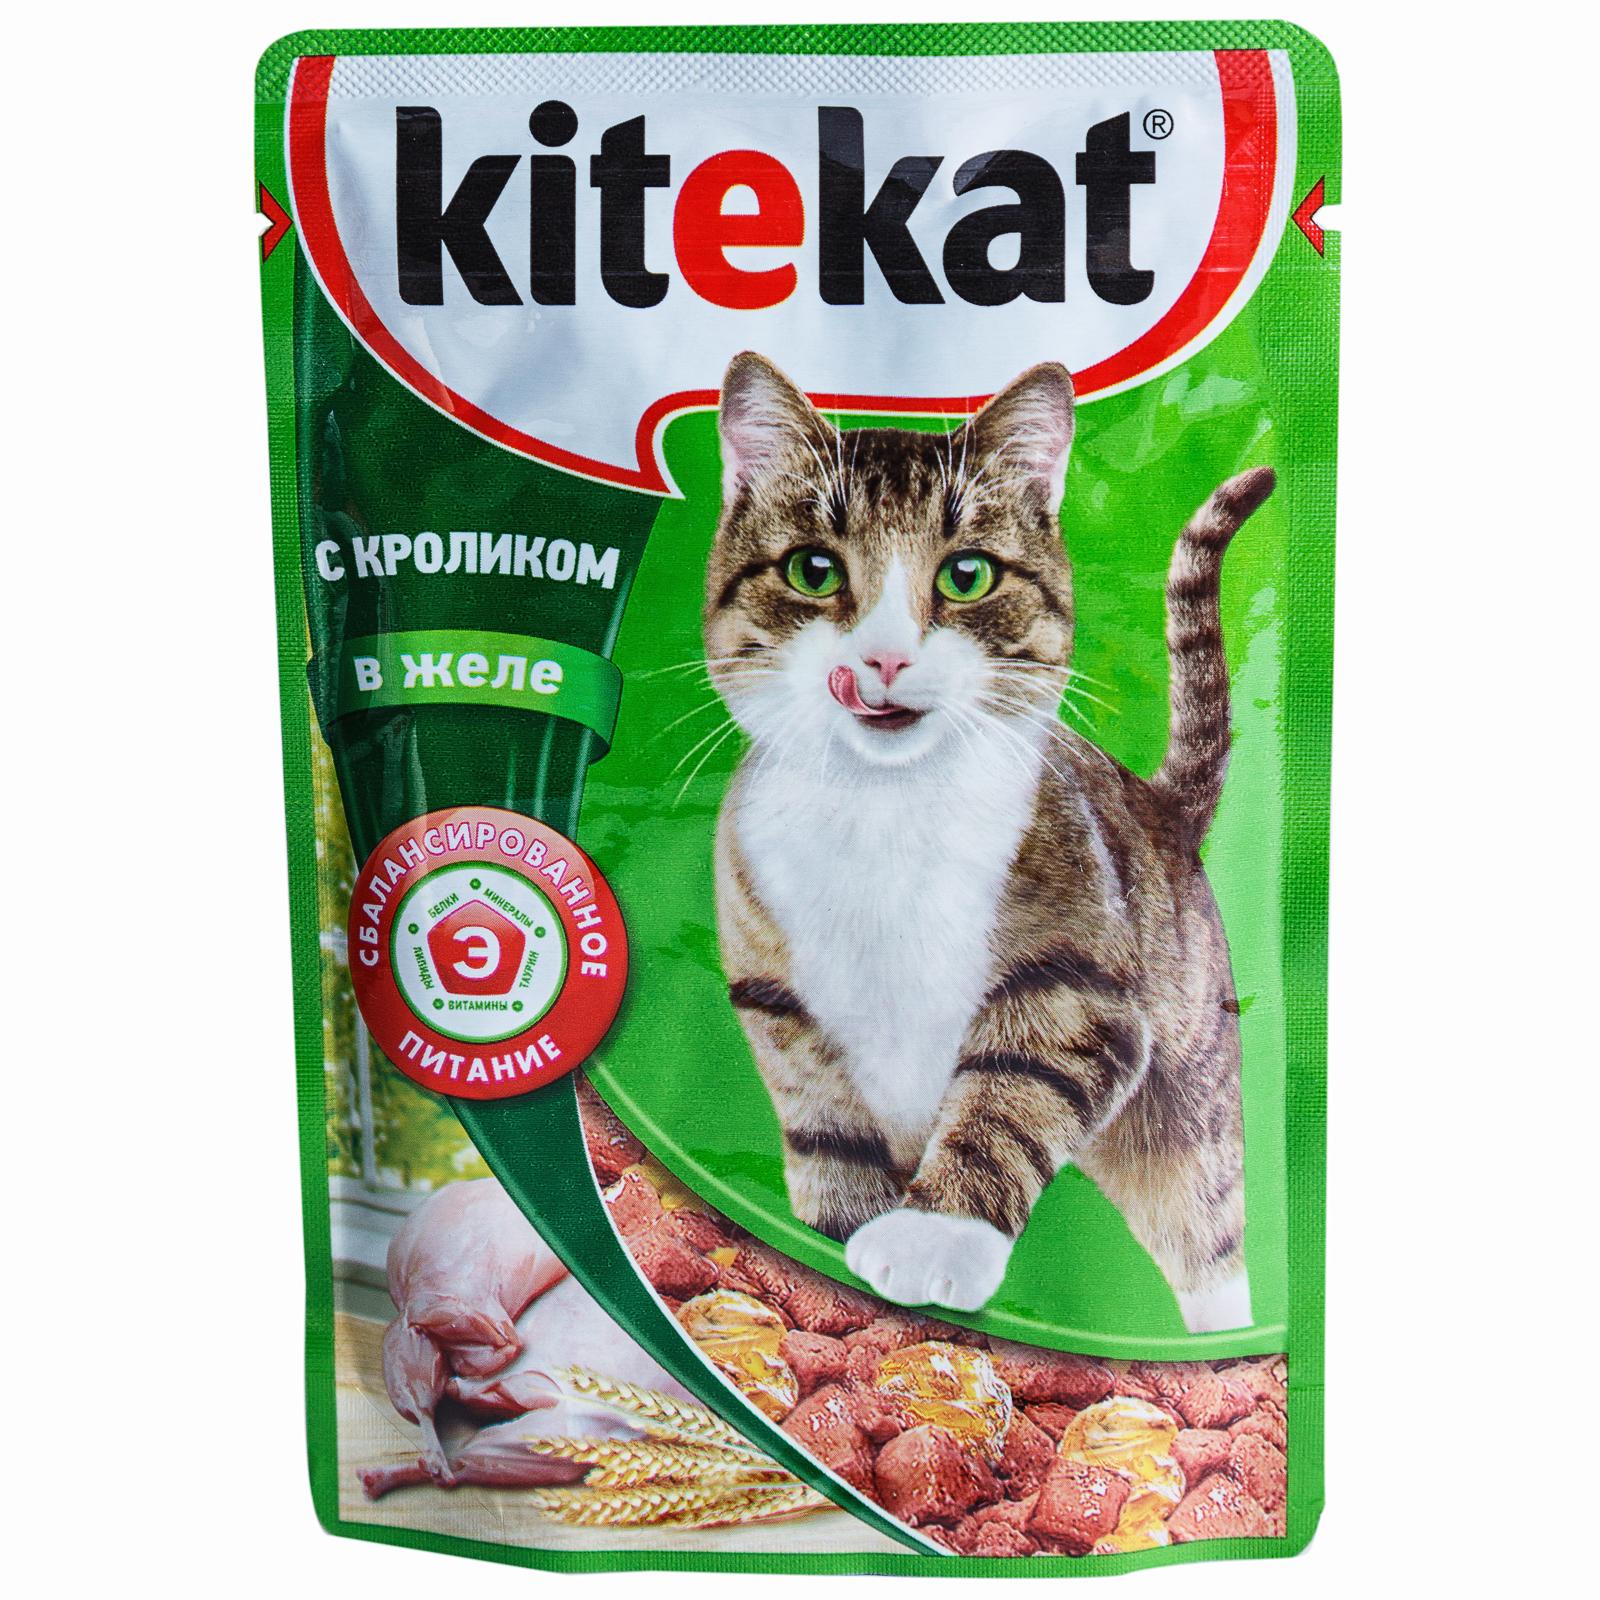 Корм Kitekat Кролик в желе 85g для кошек 10151310